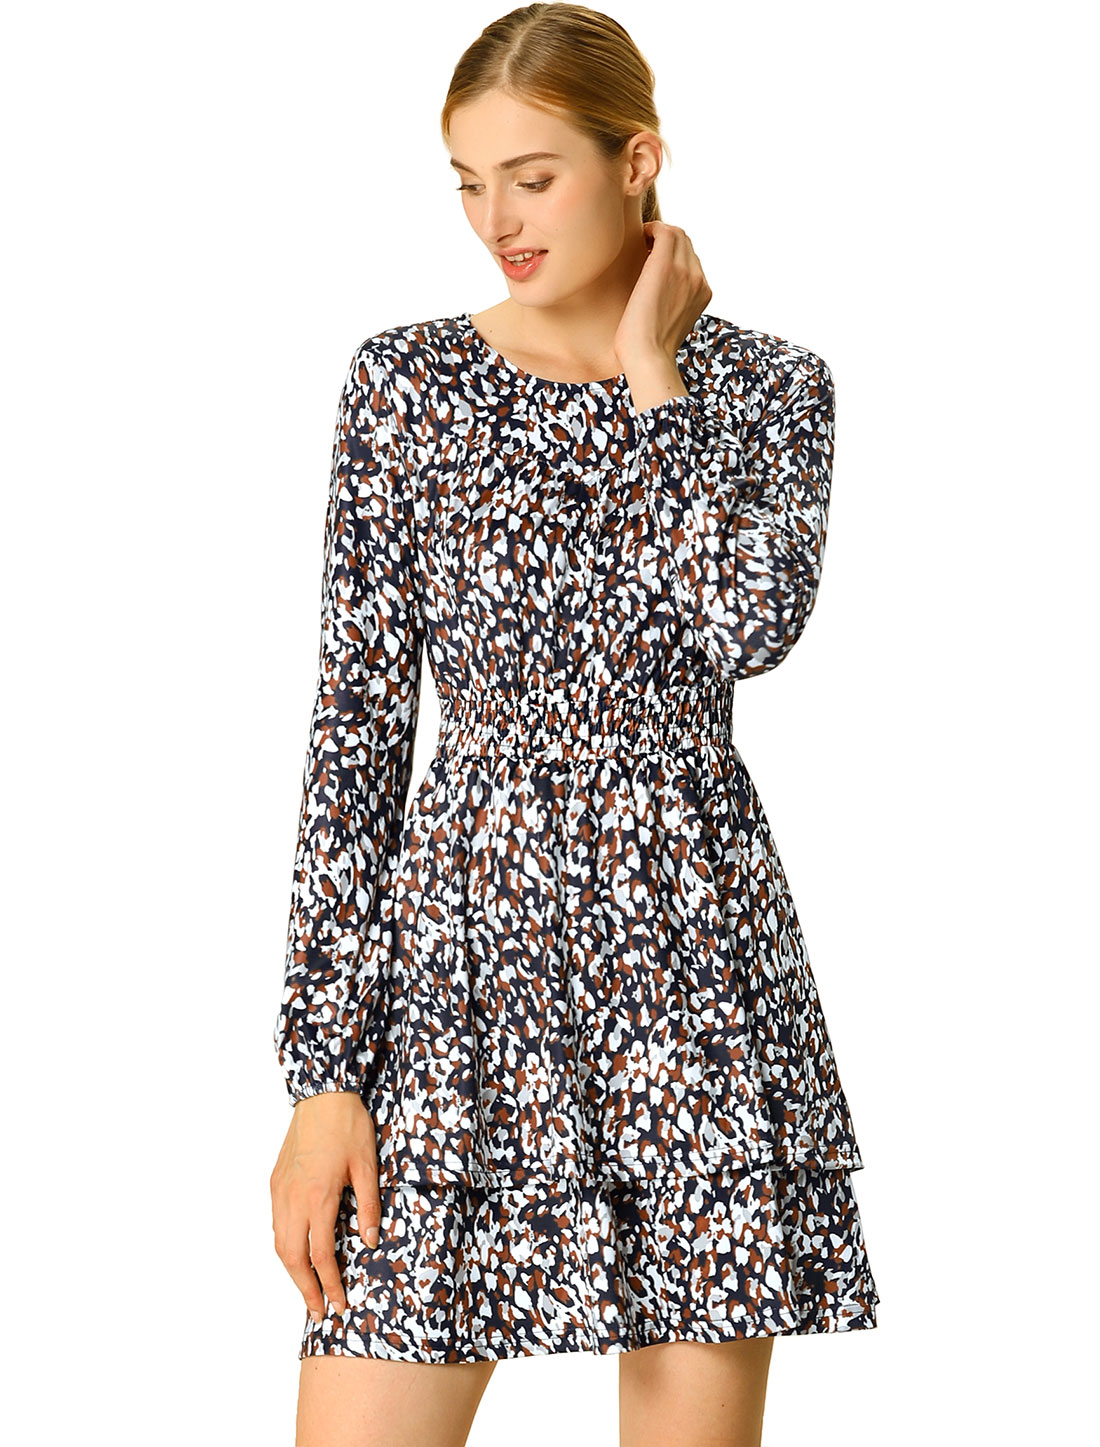 Women's Leopard Print Long Sleeve Layered Ruffle Hem Dress Blue L